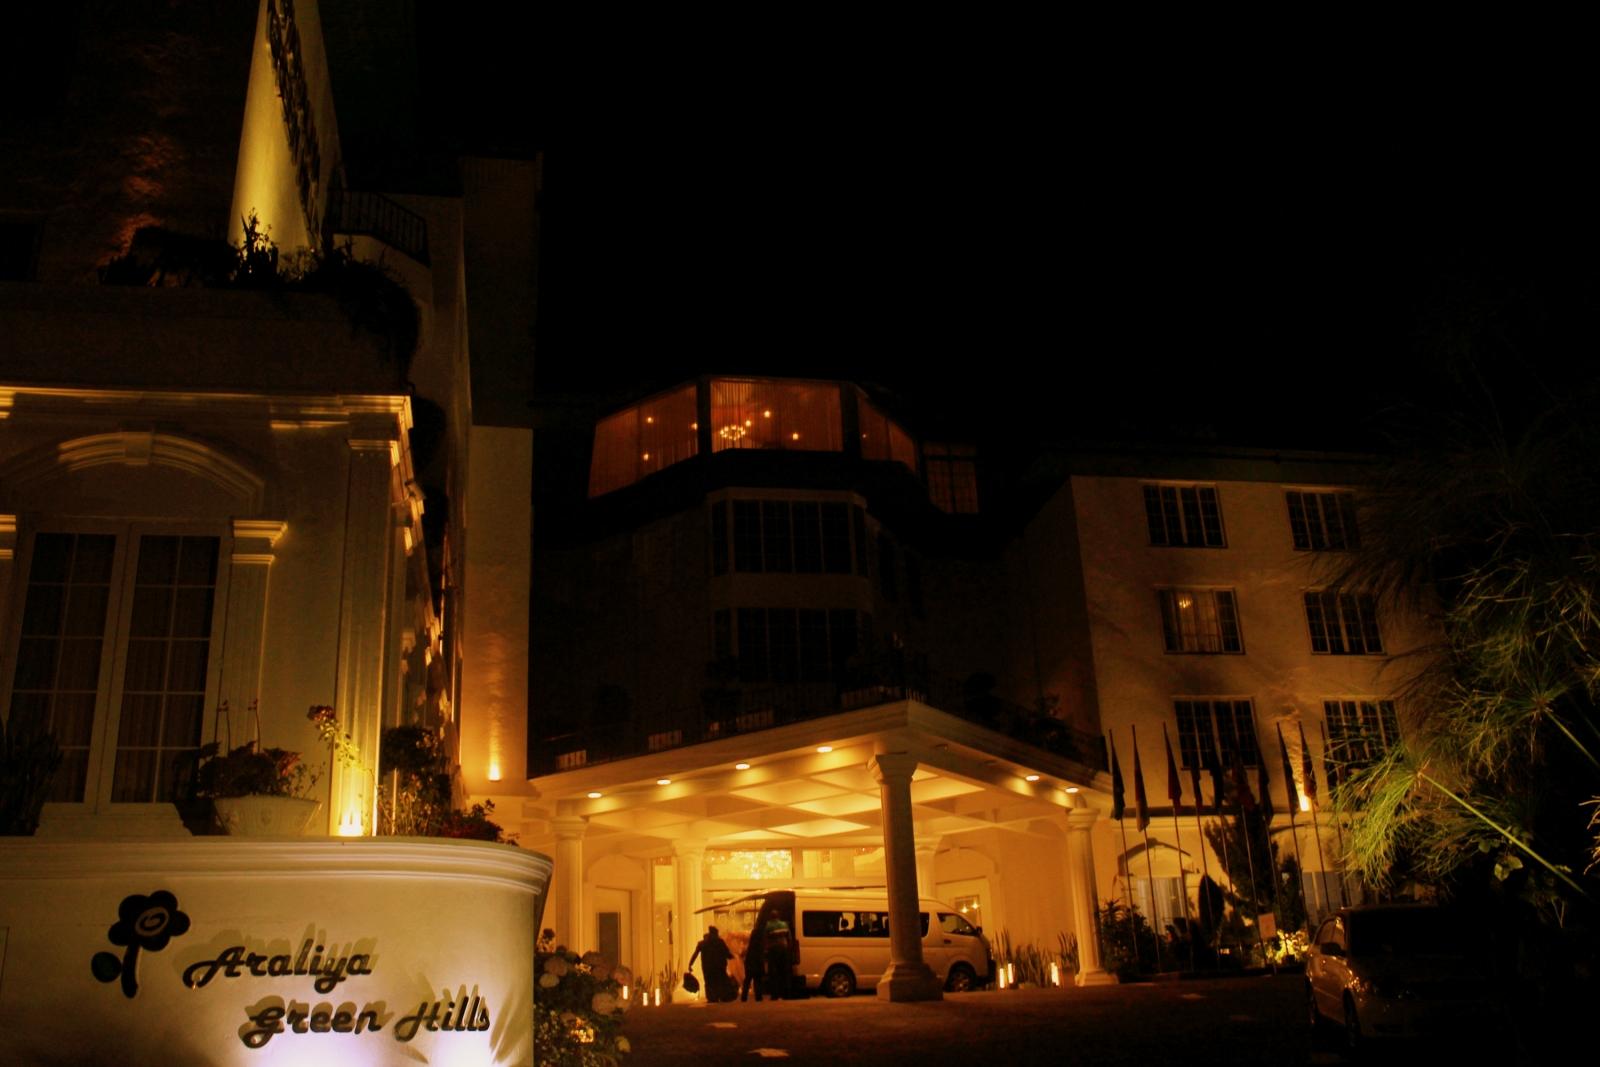 Araliya Green Hills Resort